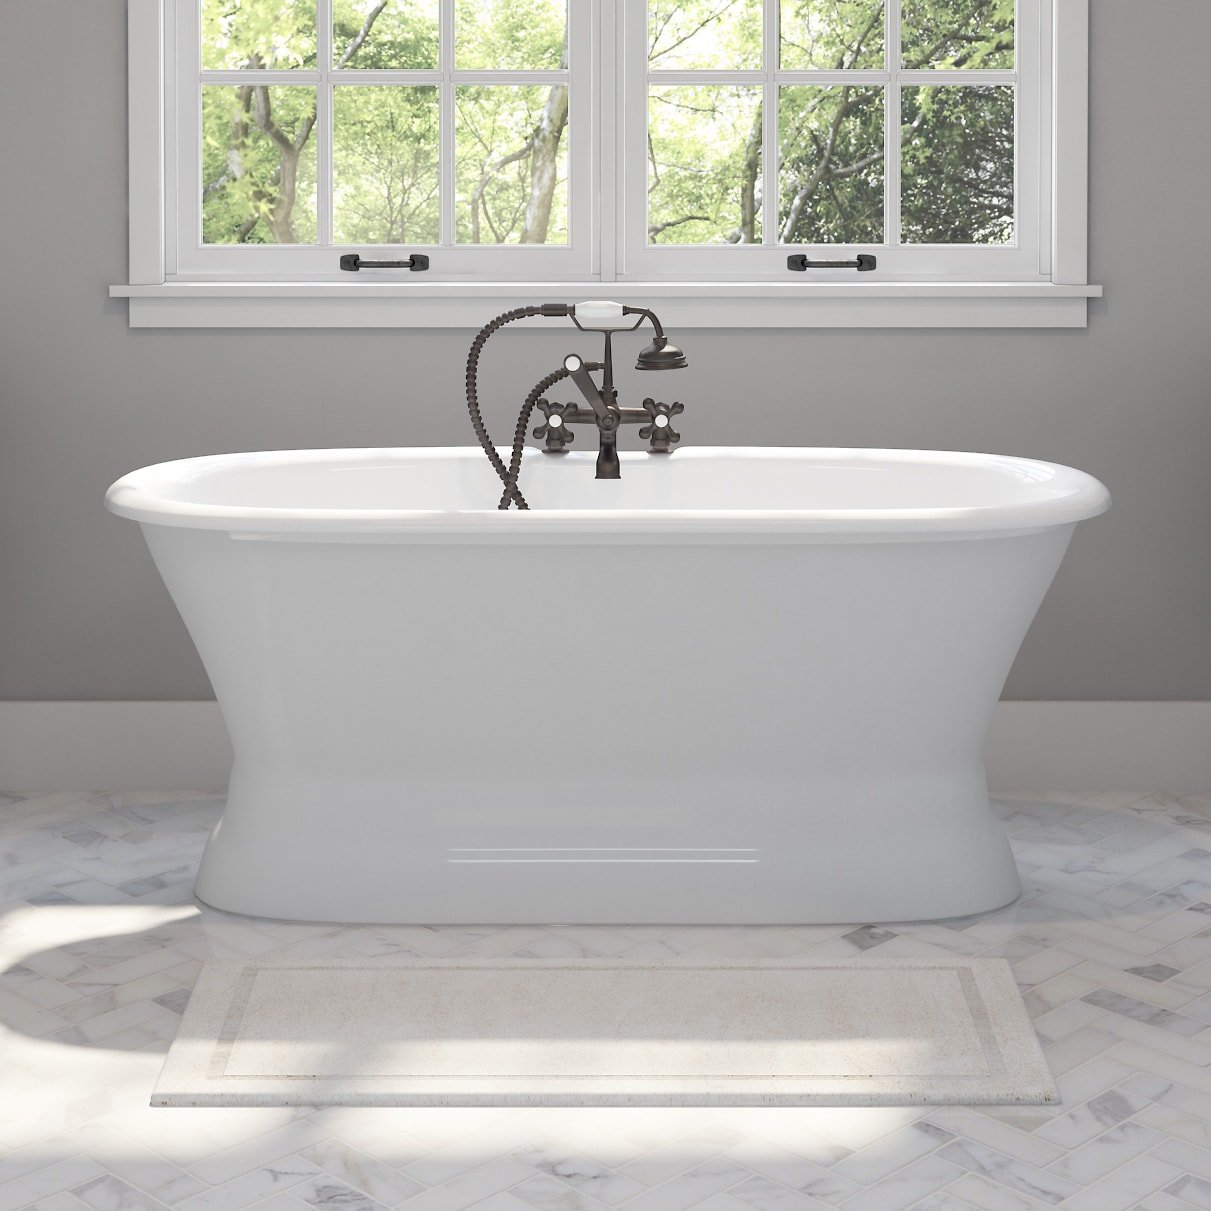 freestanding-cast-iron-and-porcelain-bathtub-high-quality-classic-bathroom-fixtures